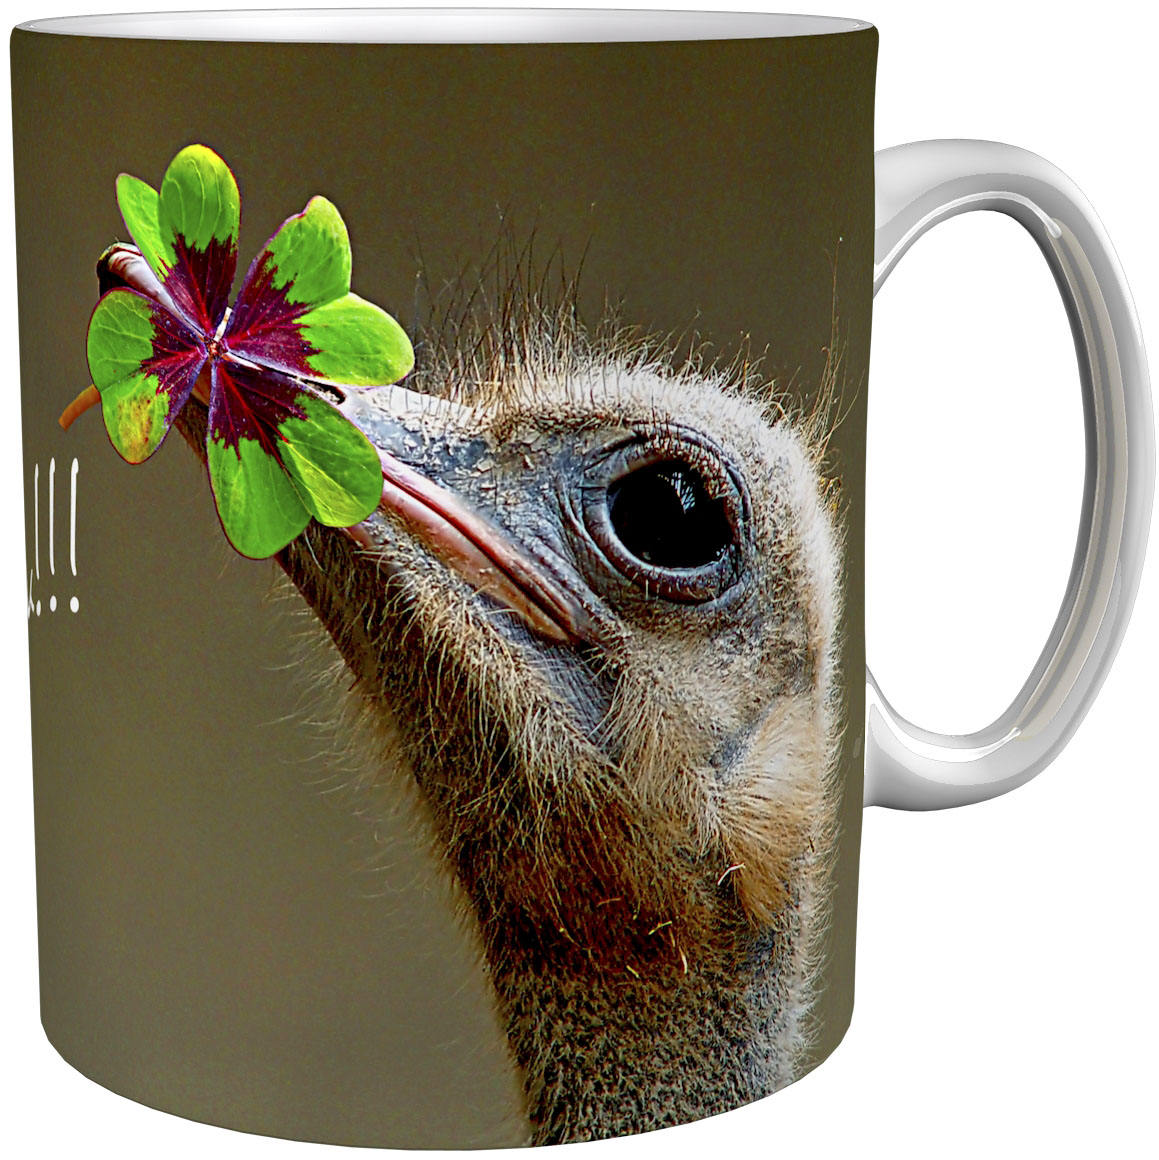 Kaffeetasse / Kaffeebecher / Strauß / Geschenktasse